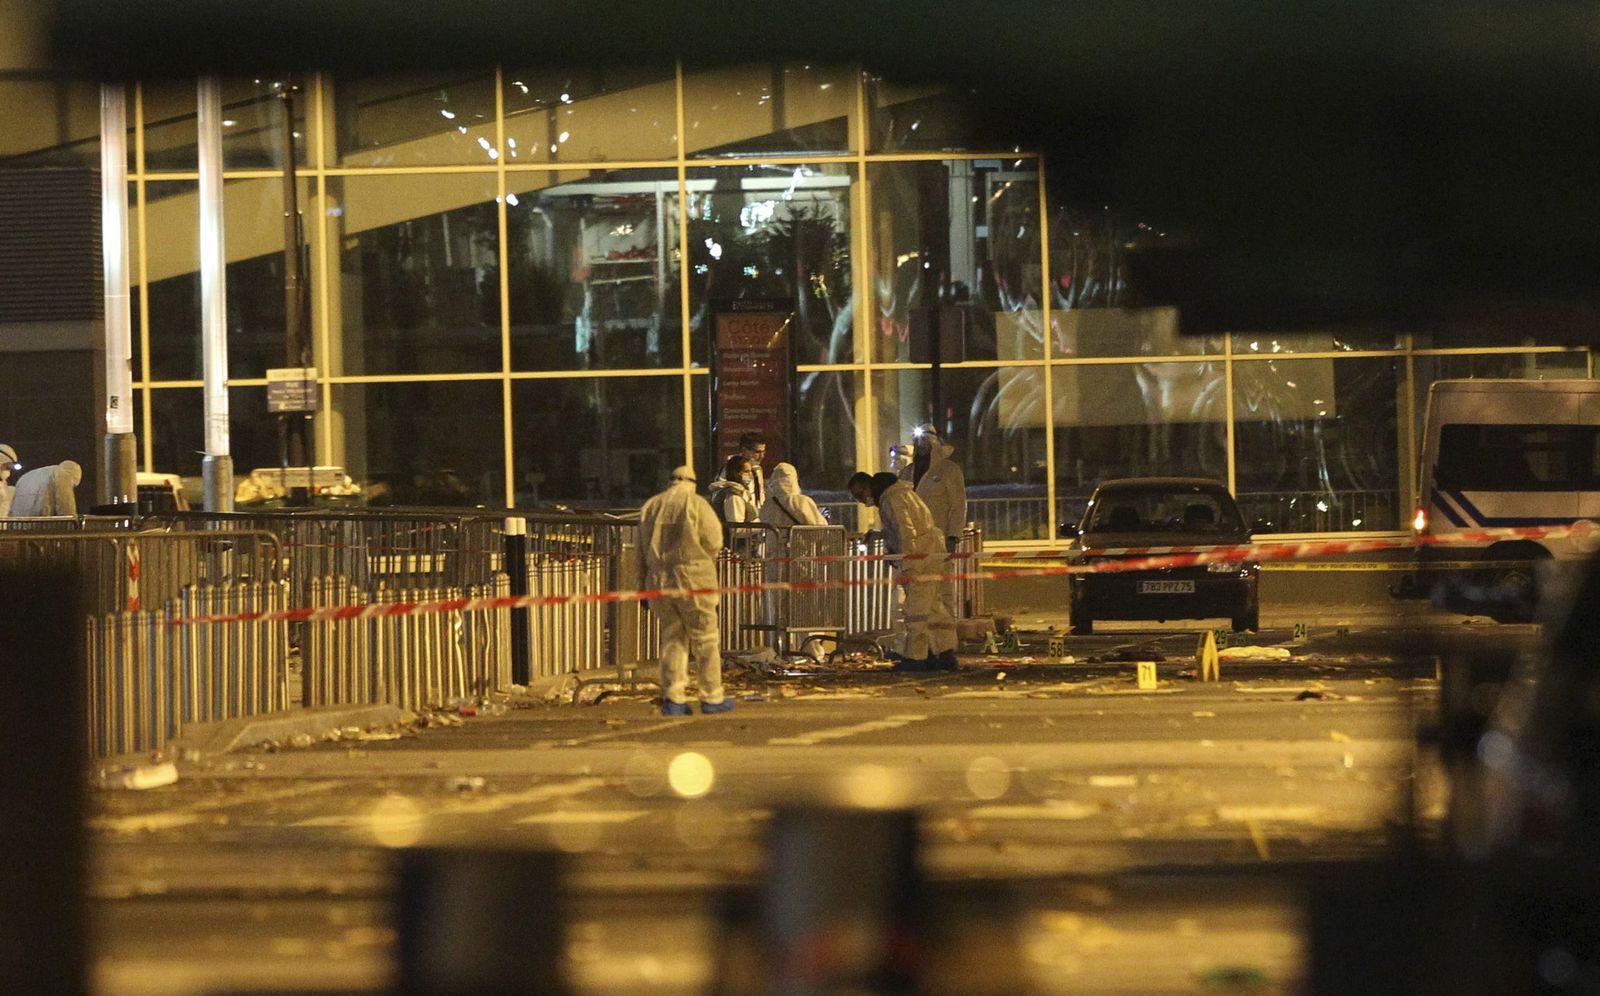 Frankreich/ Paris/ Stadion/ Anschläge 13.11.15/ Stade de France